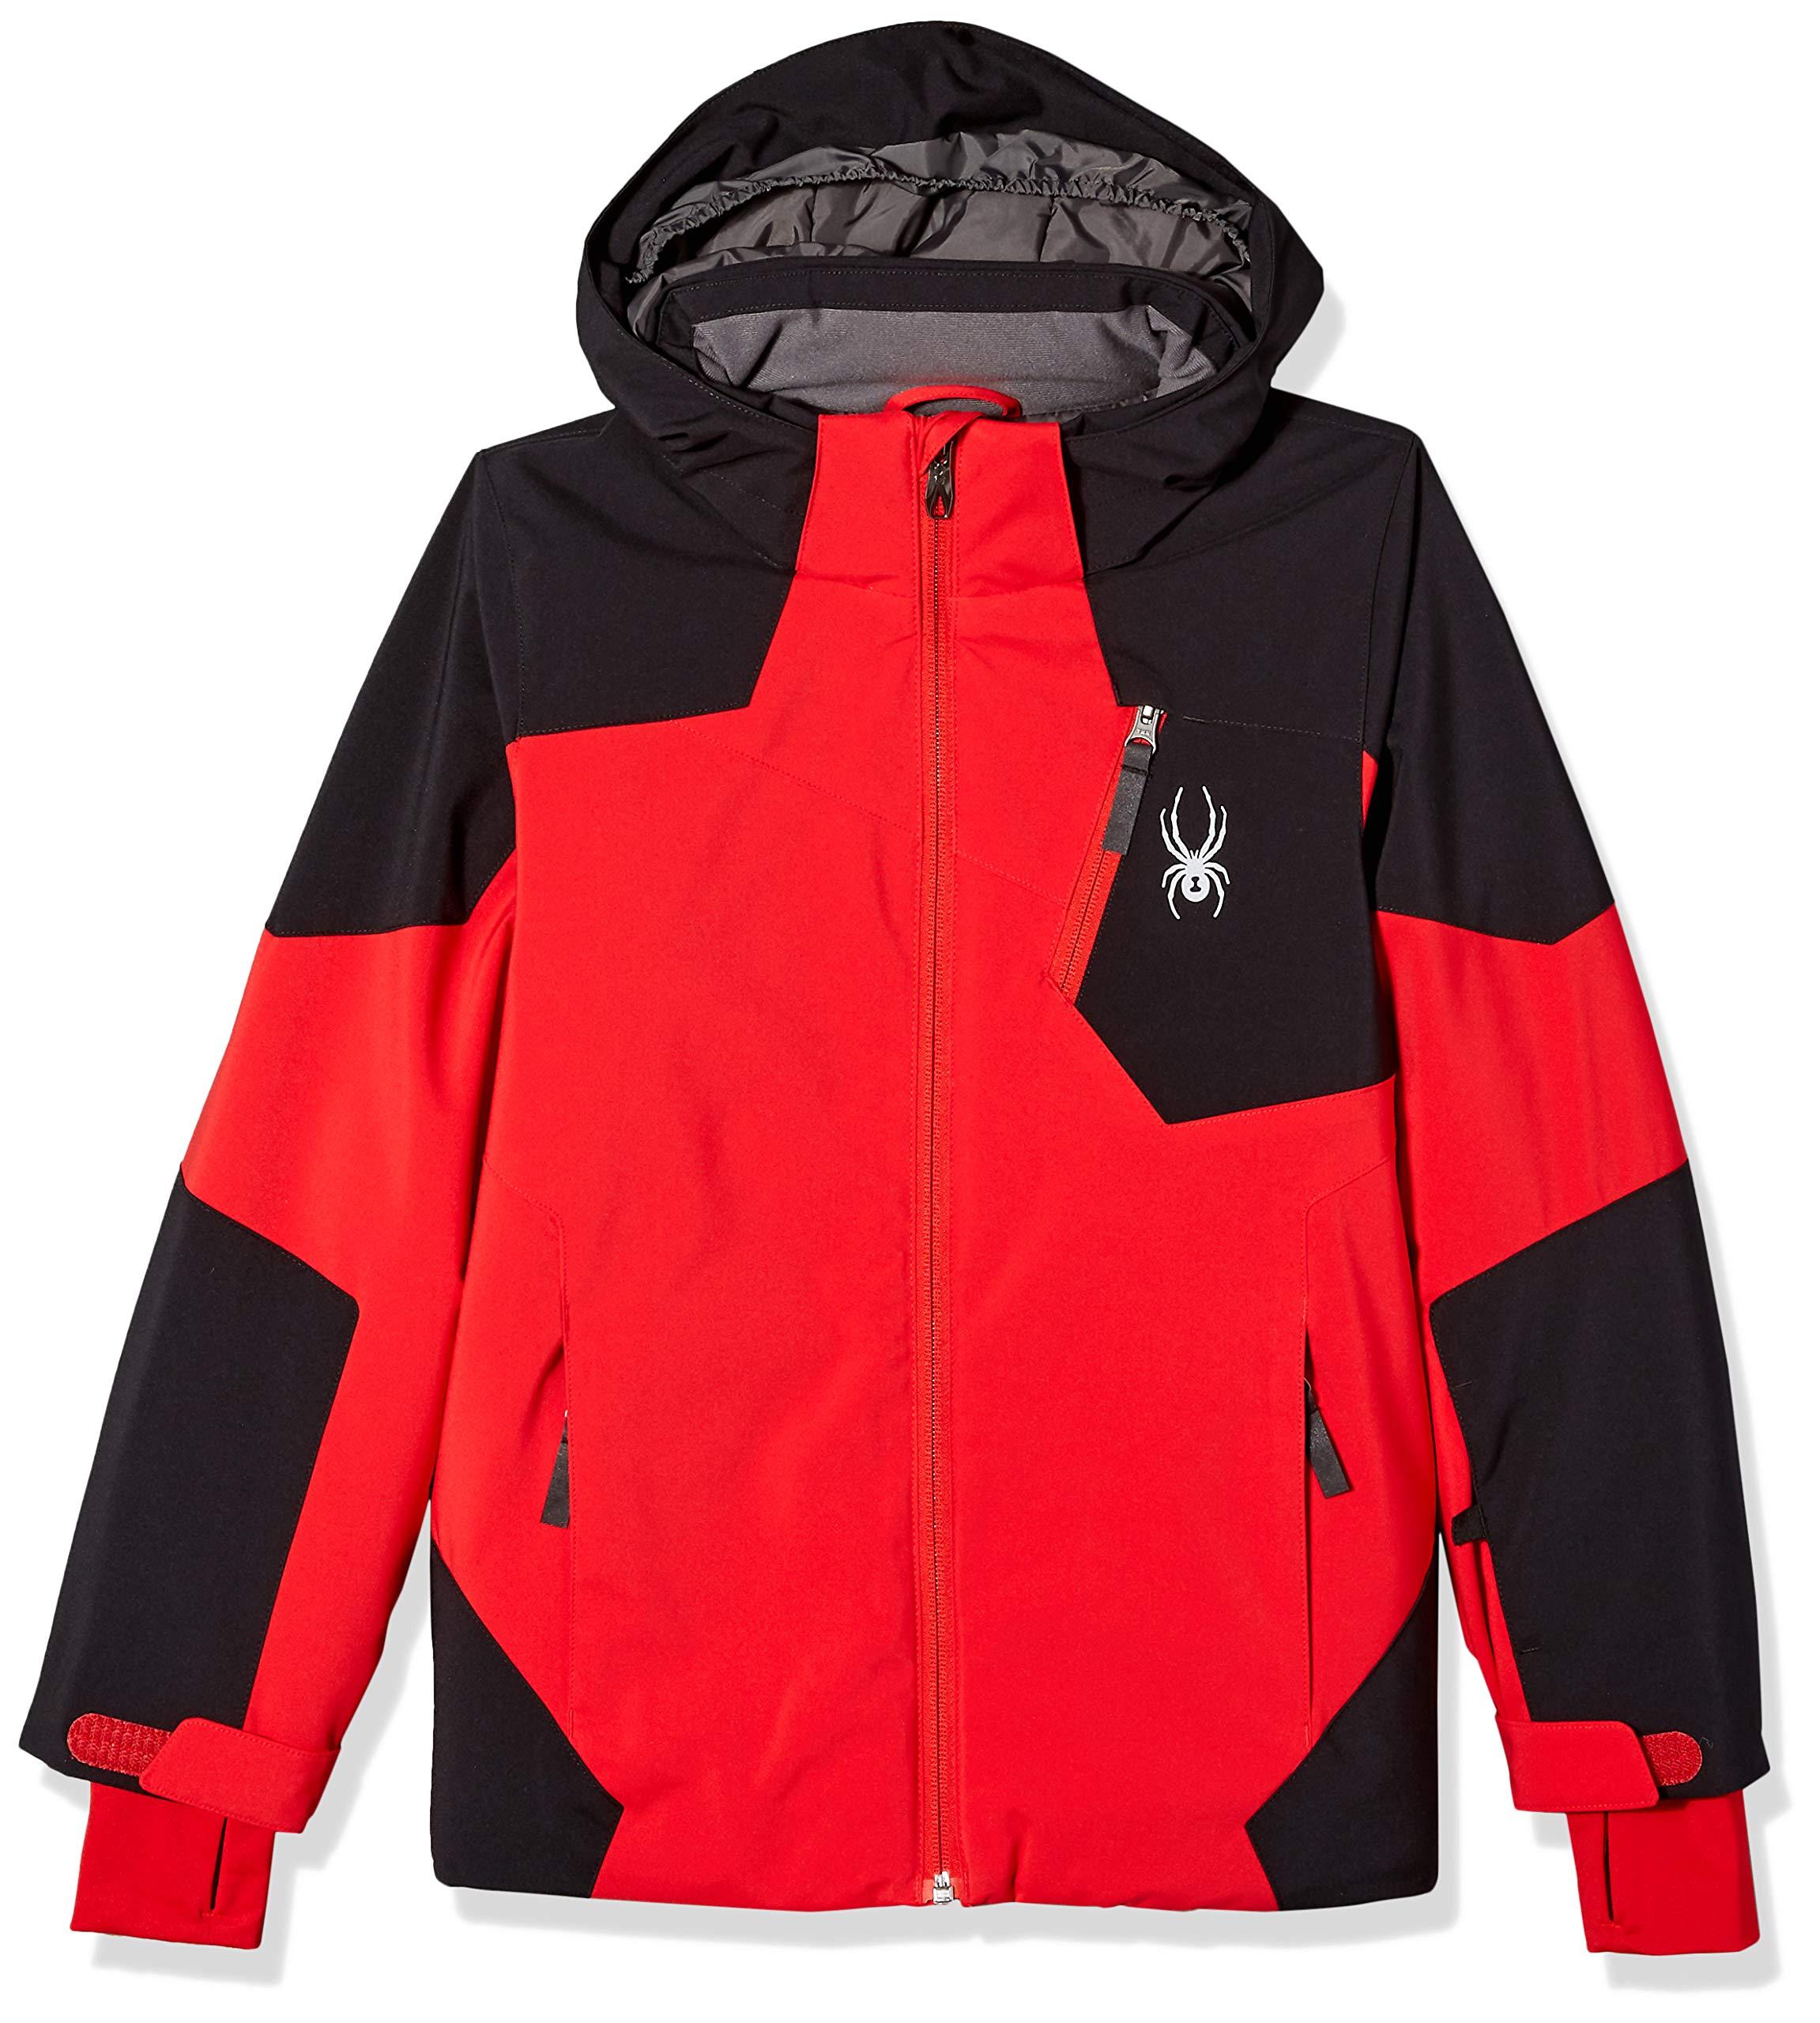 Spyder Boys' Chambers Ski Jacket, Red/Black/Red, Size 10